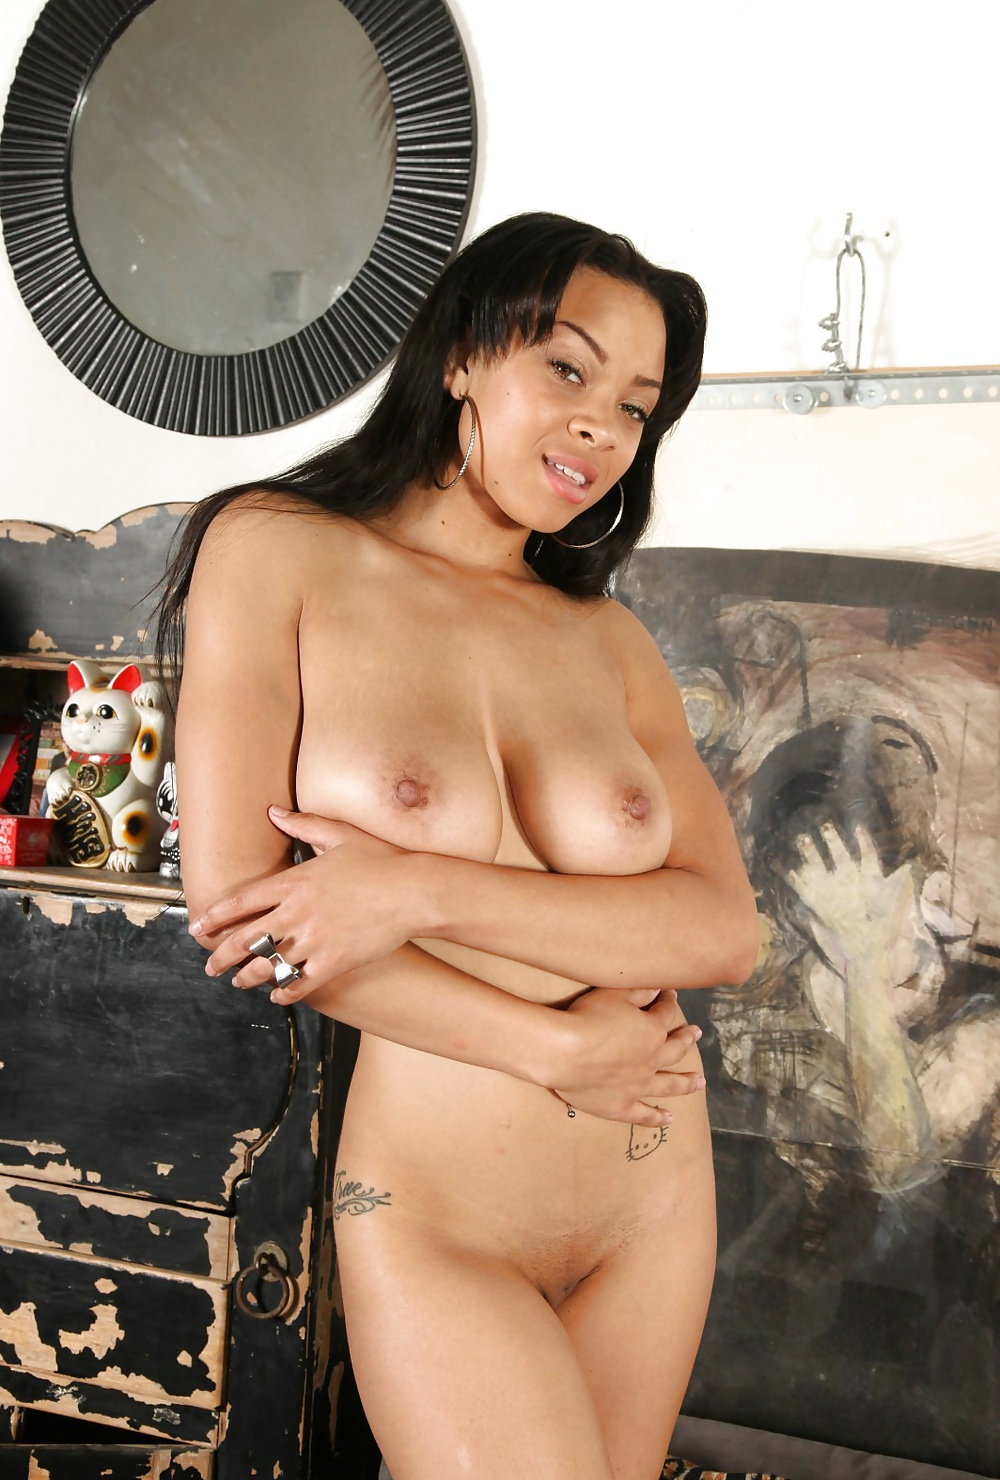 Hefler recommends Prefer nude or spank punishment